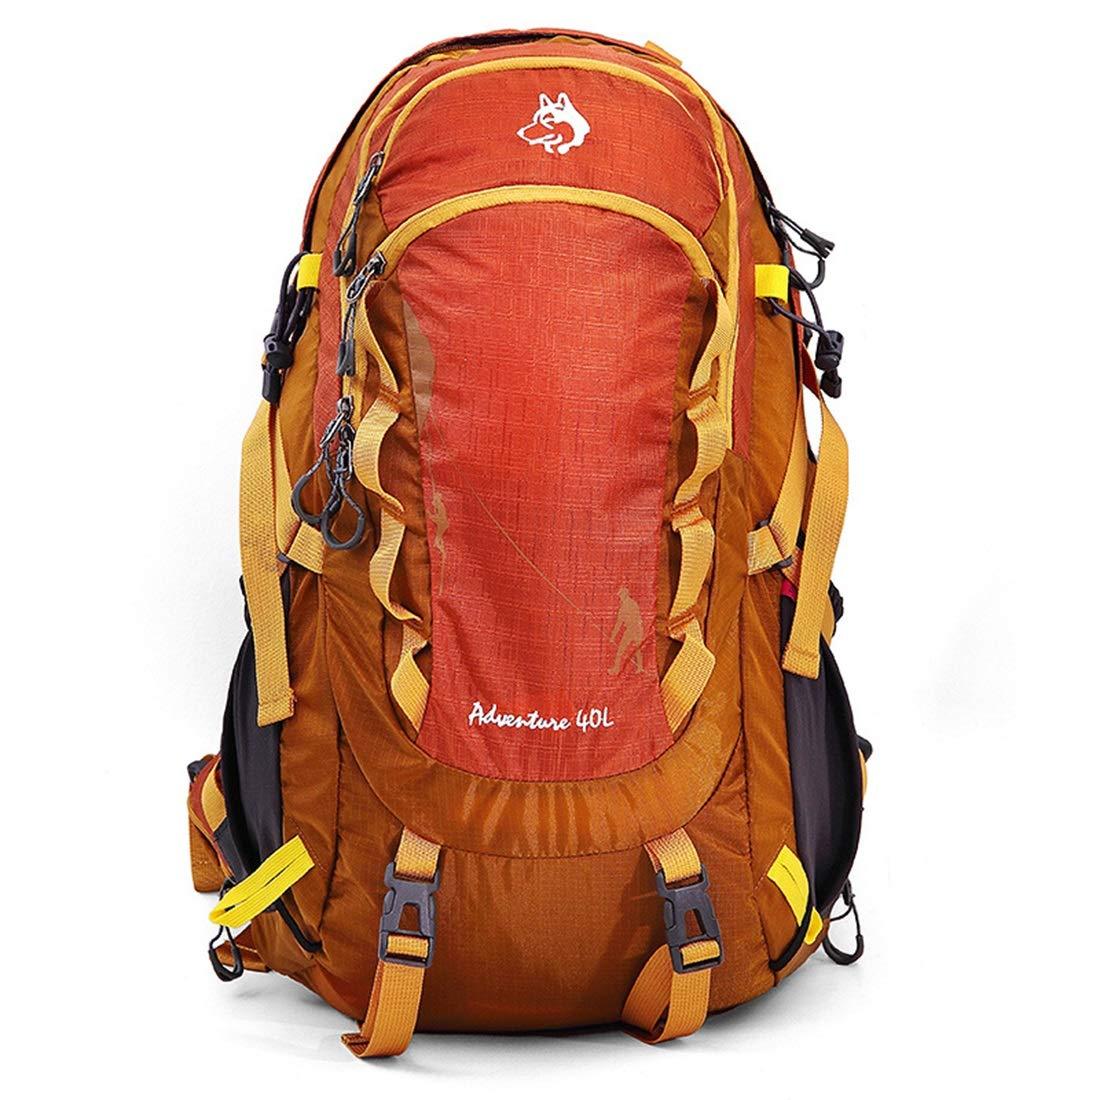 CAFUTY 登山バックパック防水大容量野生のキャンプ旅行でのレジャースポーツ中立男性と女性の多機能ショルダーアウトドア用に適した (Color : オレンジ)   B07P6KRNX5